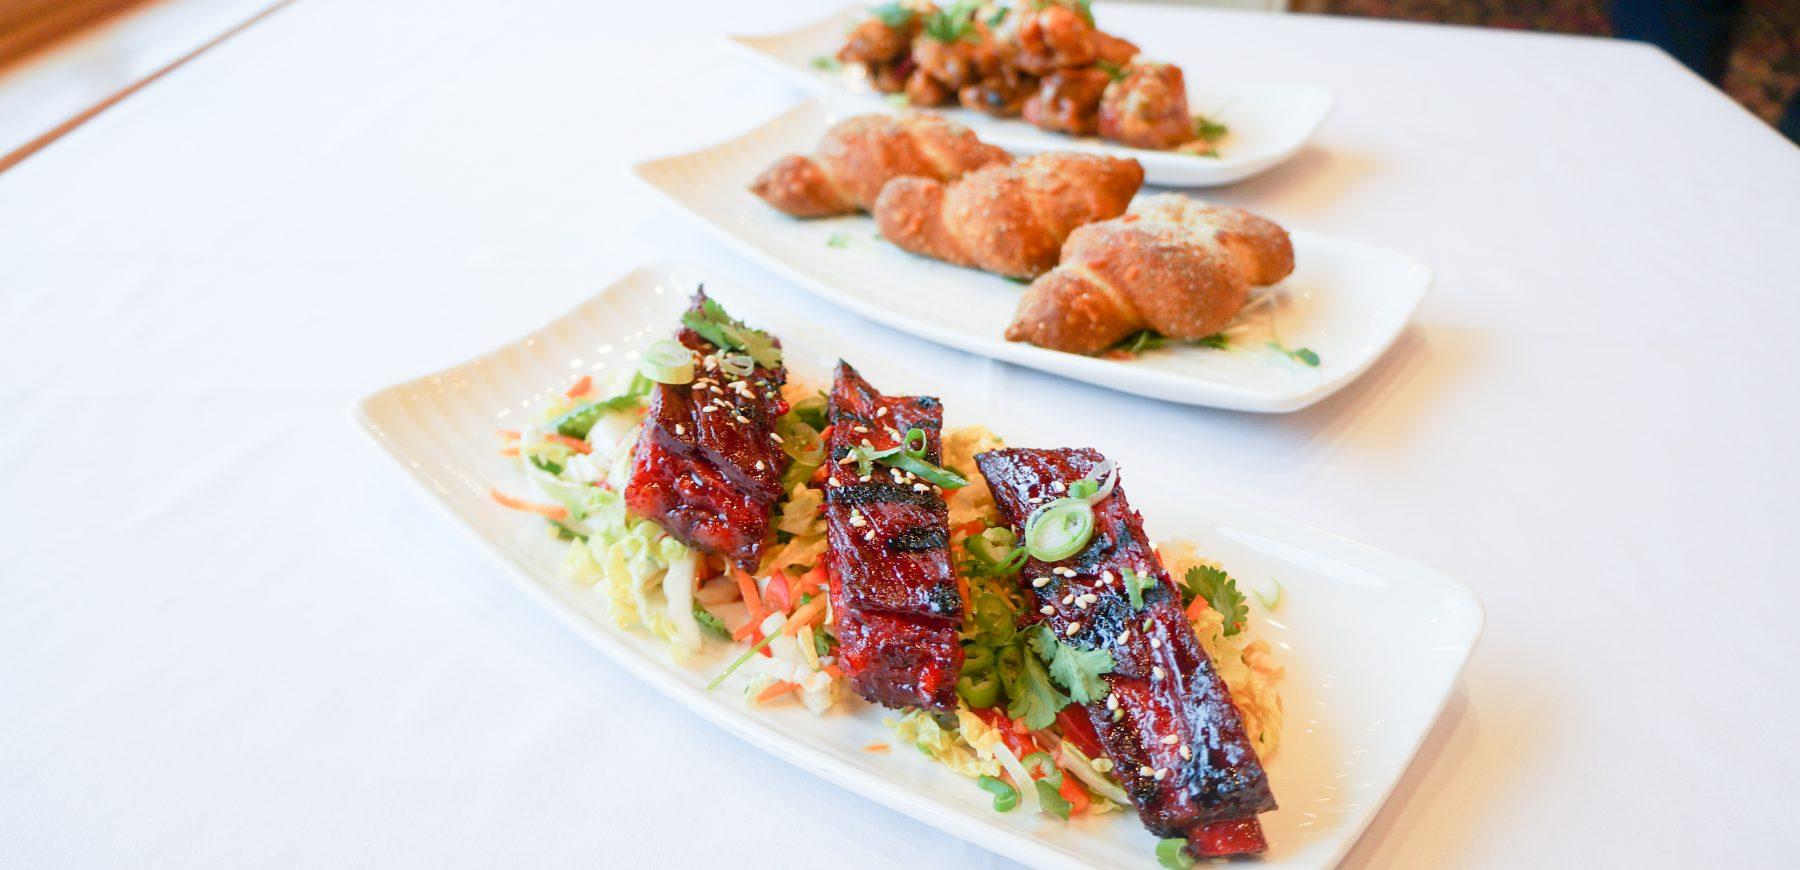 char siu pork ribs, chicken wings and pretzel knots